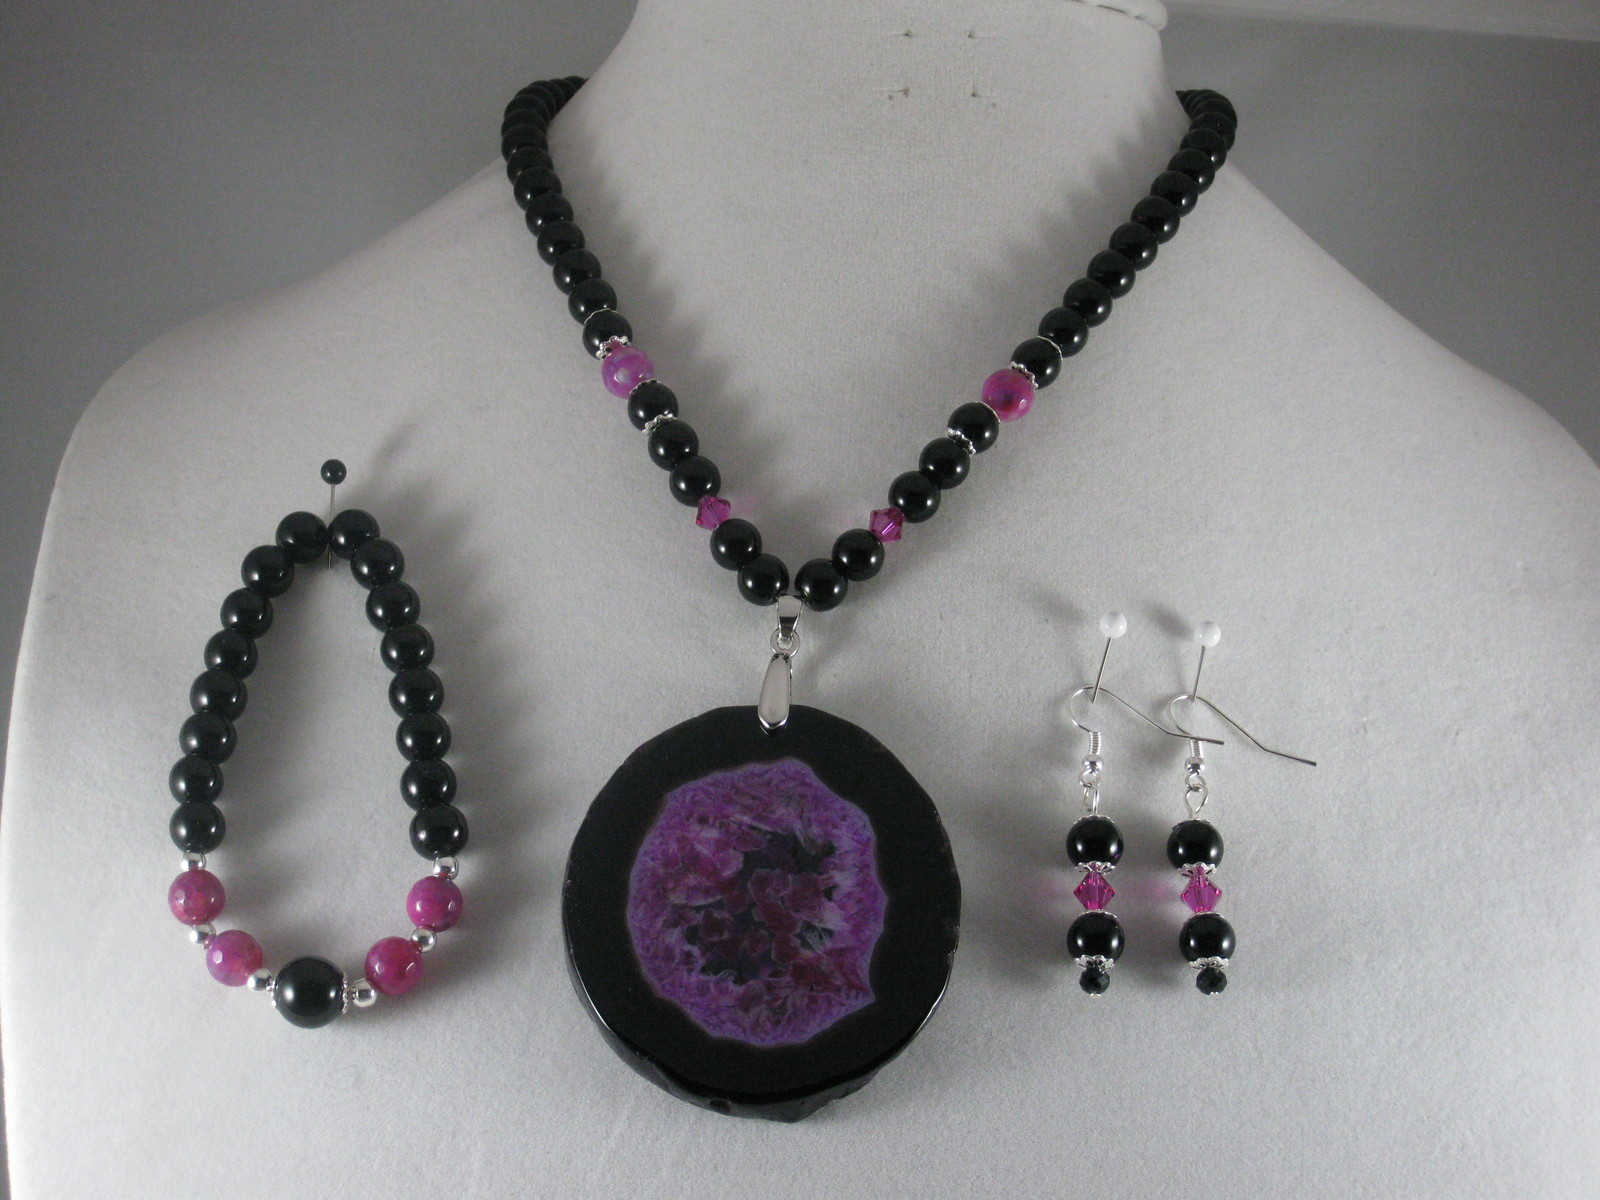 NEW Black and Rose Druzy Geode Agate slice Pendant Necklace Set